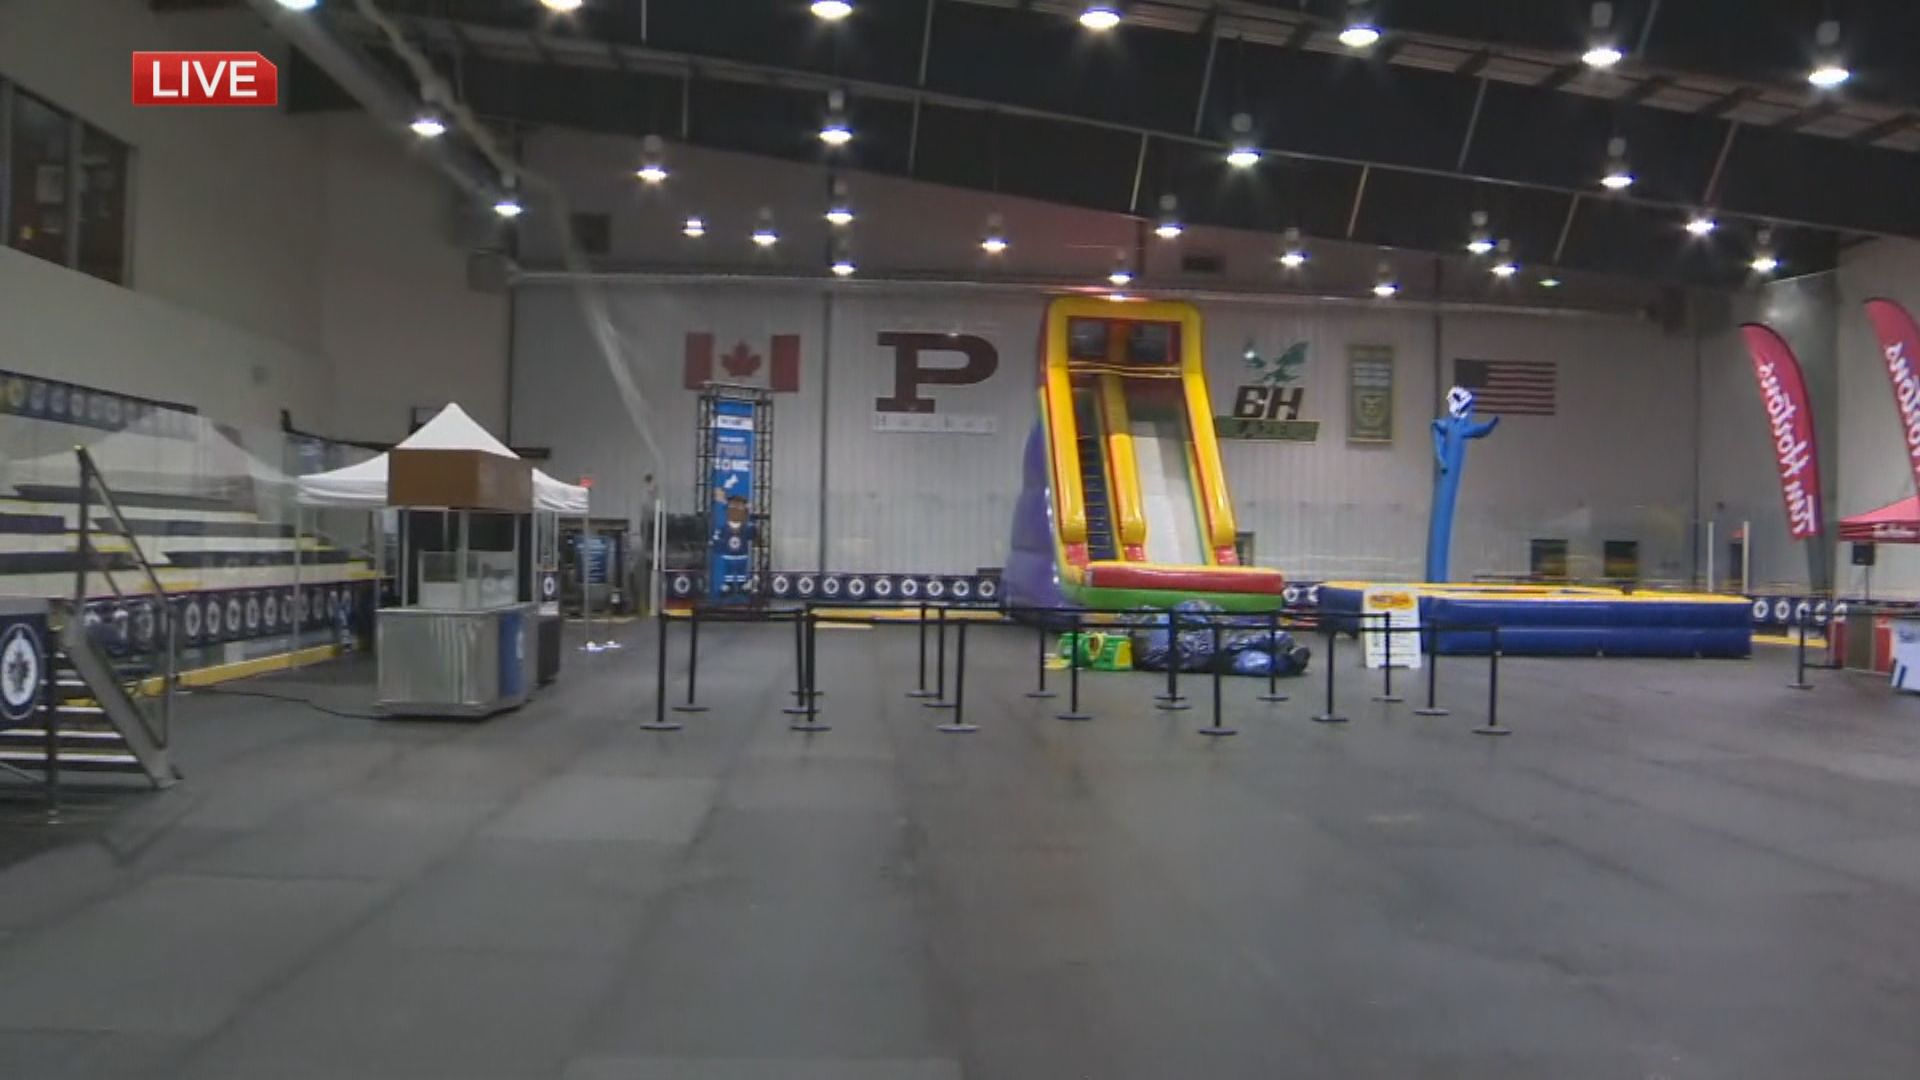 Manitoba Moose milestone at Jets Fan Fest